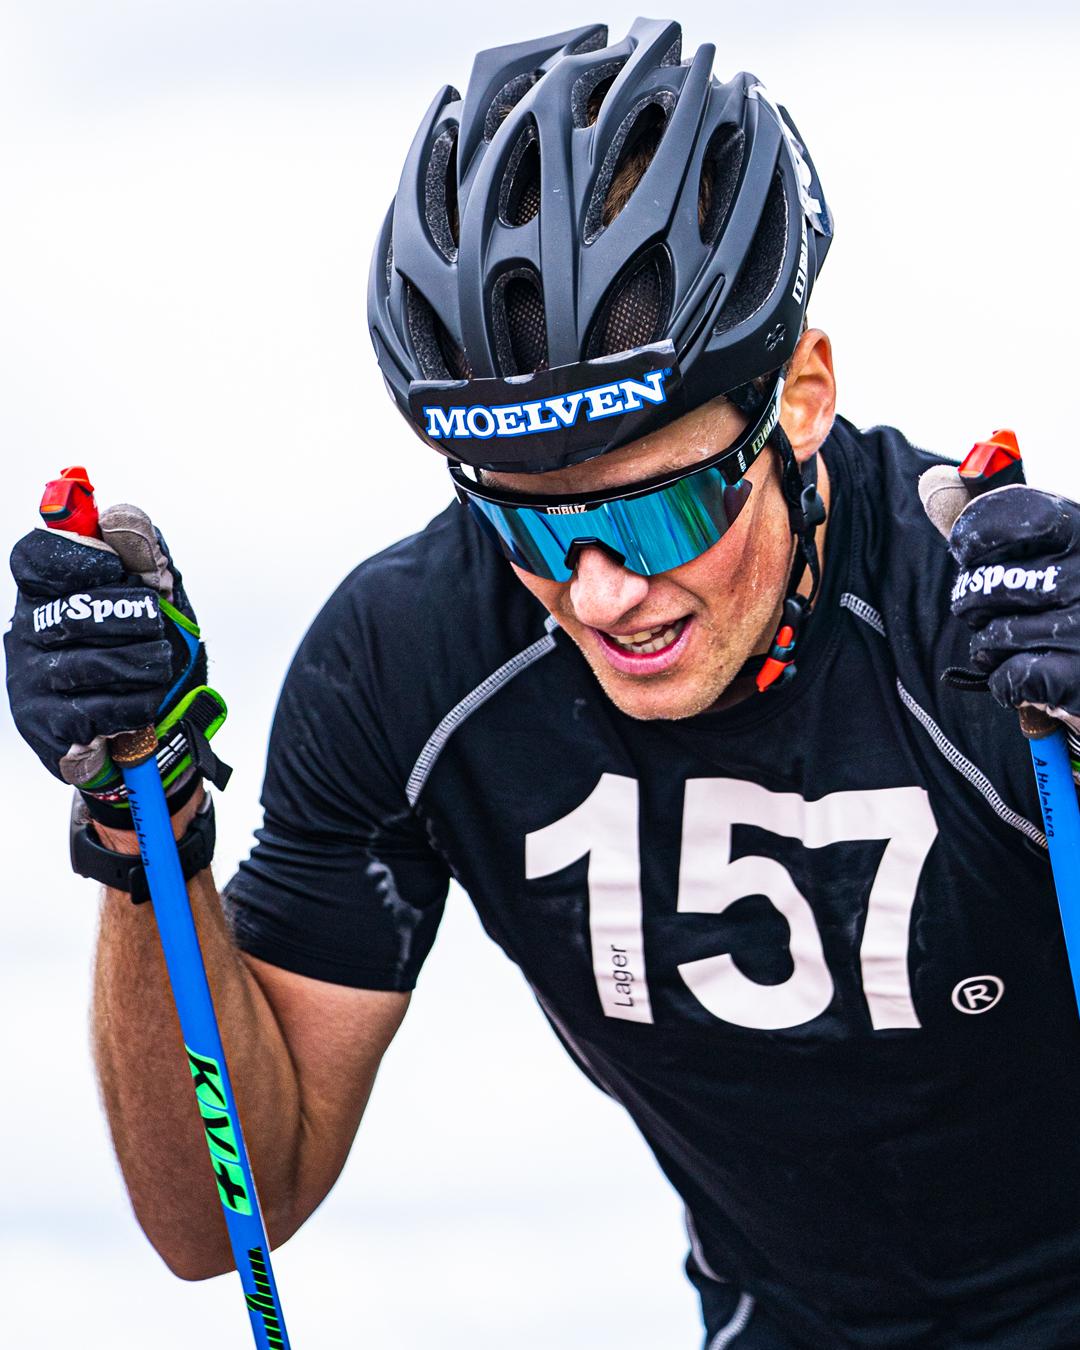 Andreas Holmberg, Lager 157 Ski Team